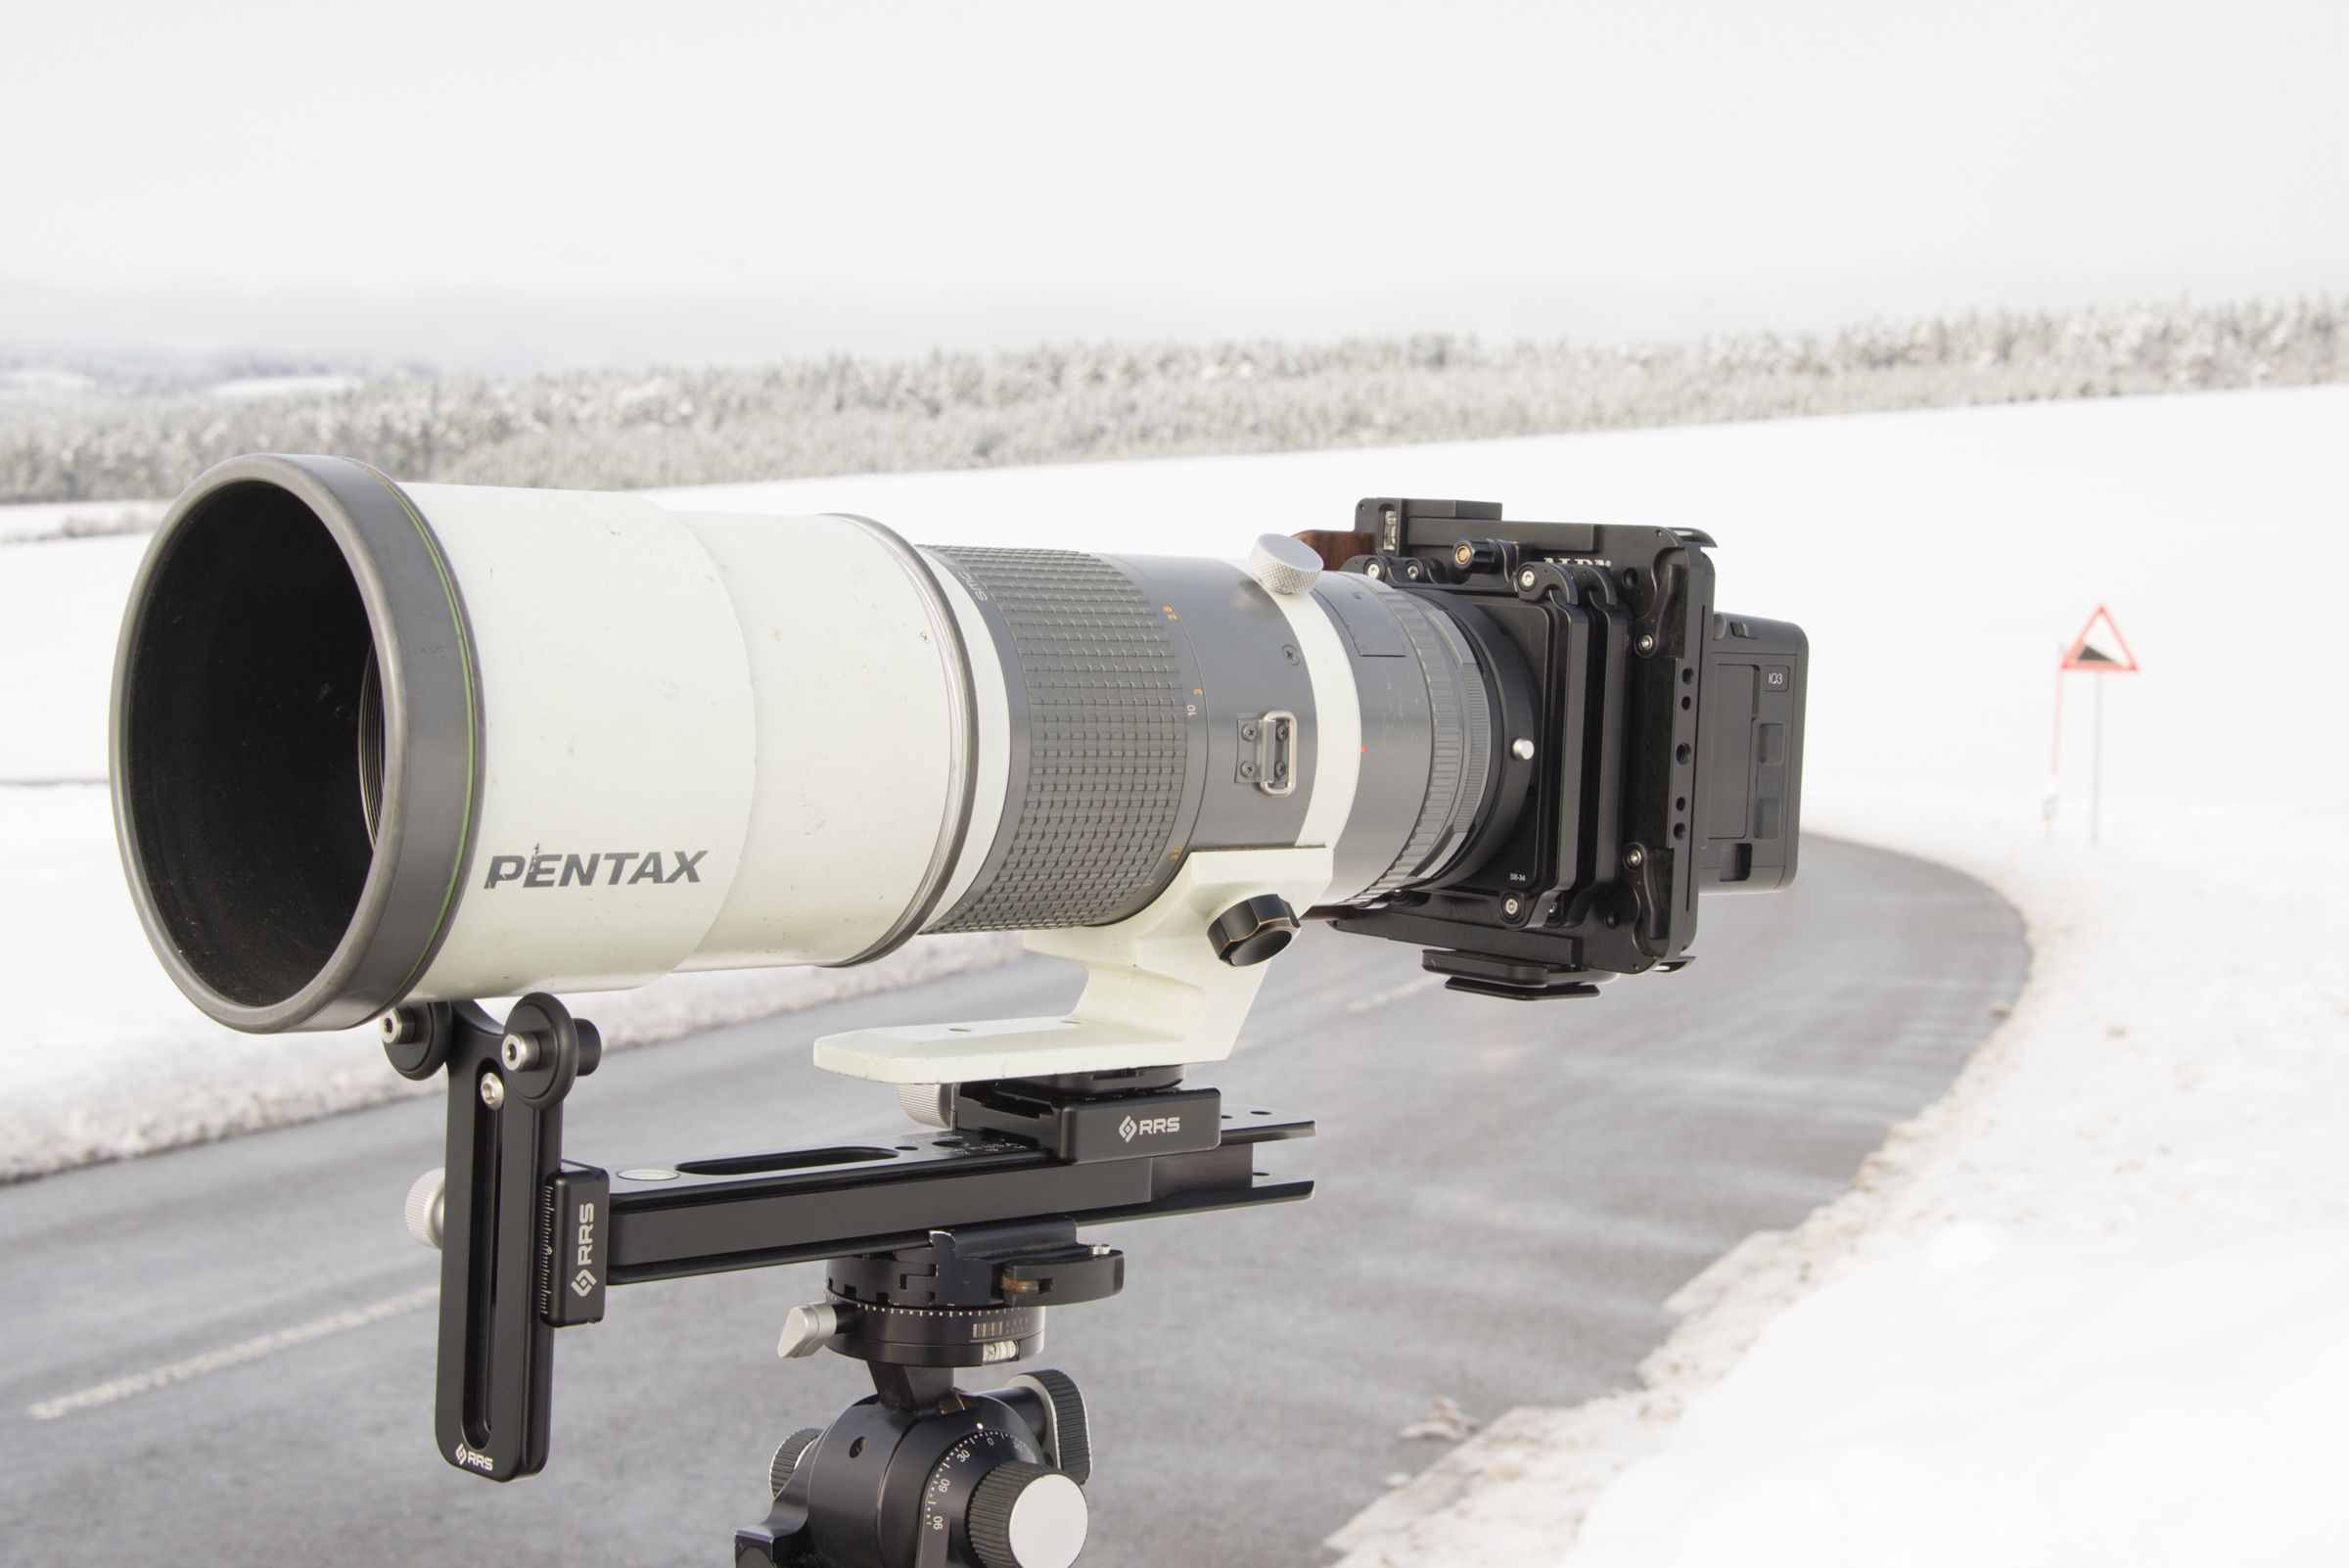 ALPA 12 STC with Pentax 67 400mm.